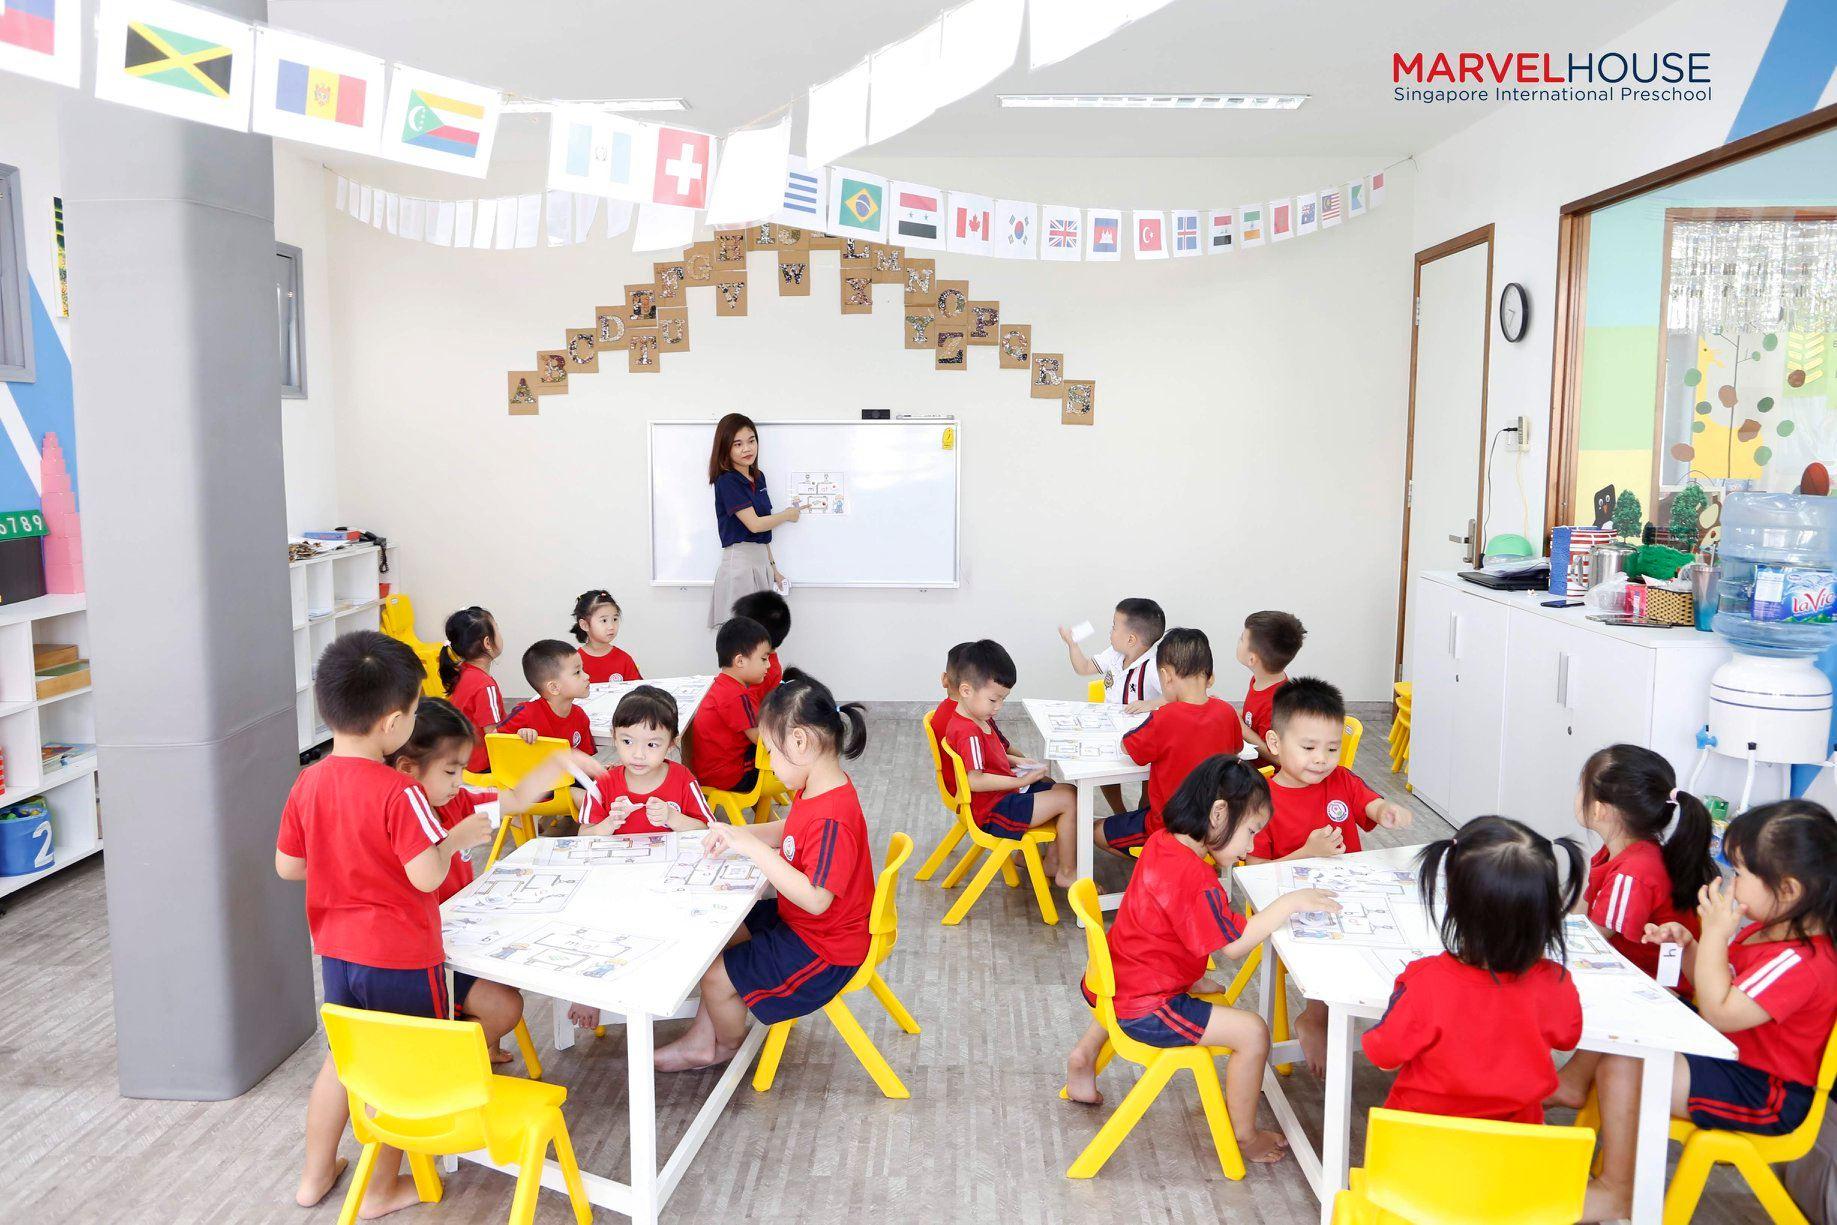 Trường mầm non quốc tế Marvel House singapore international